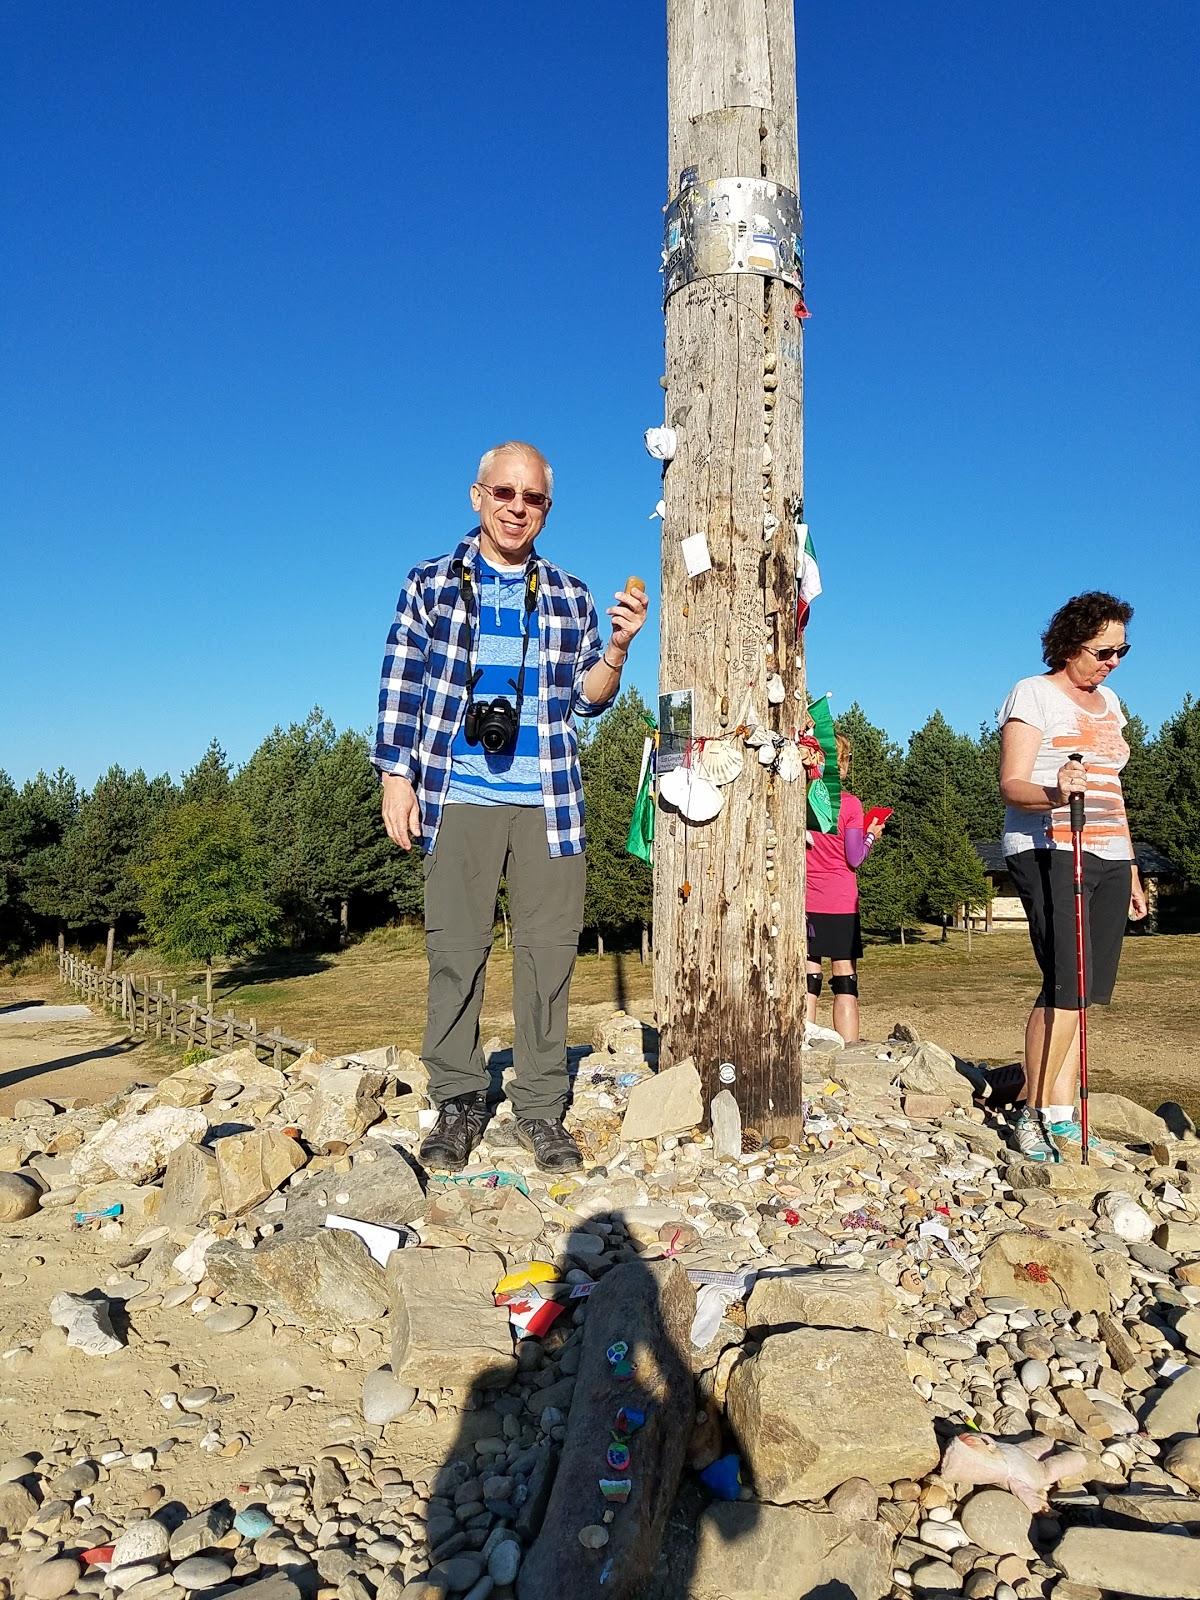 Preparing to toss my burden of stone at the Cruz de Ferro.